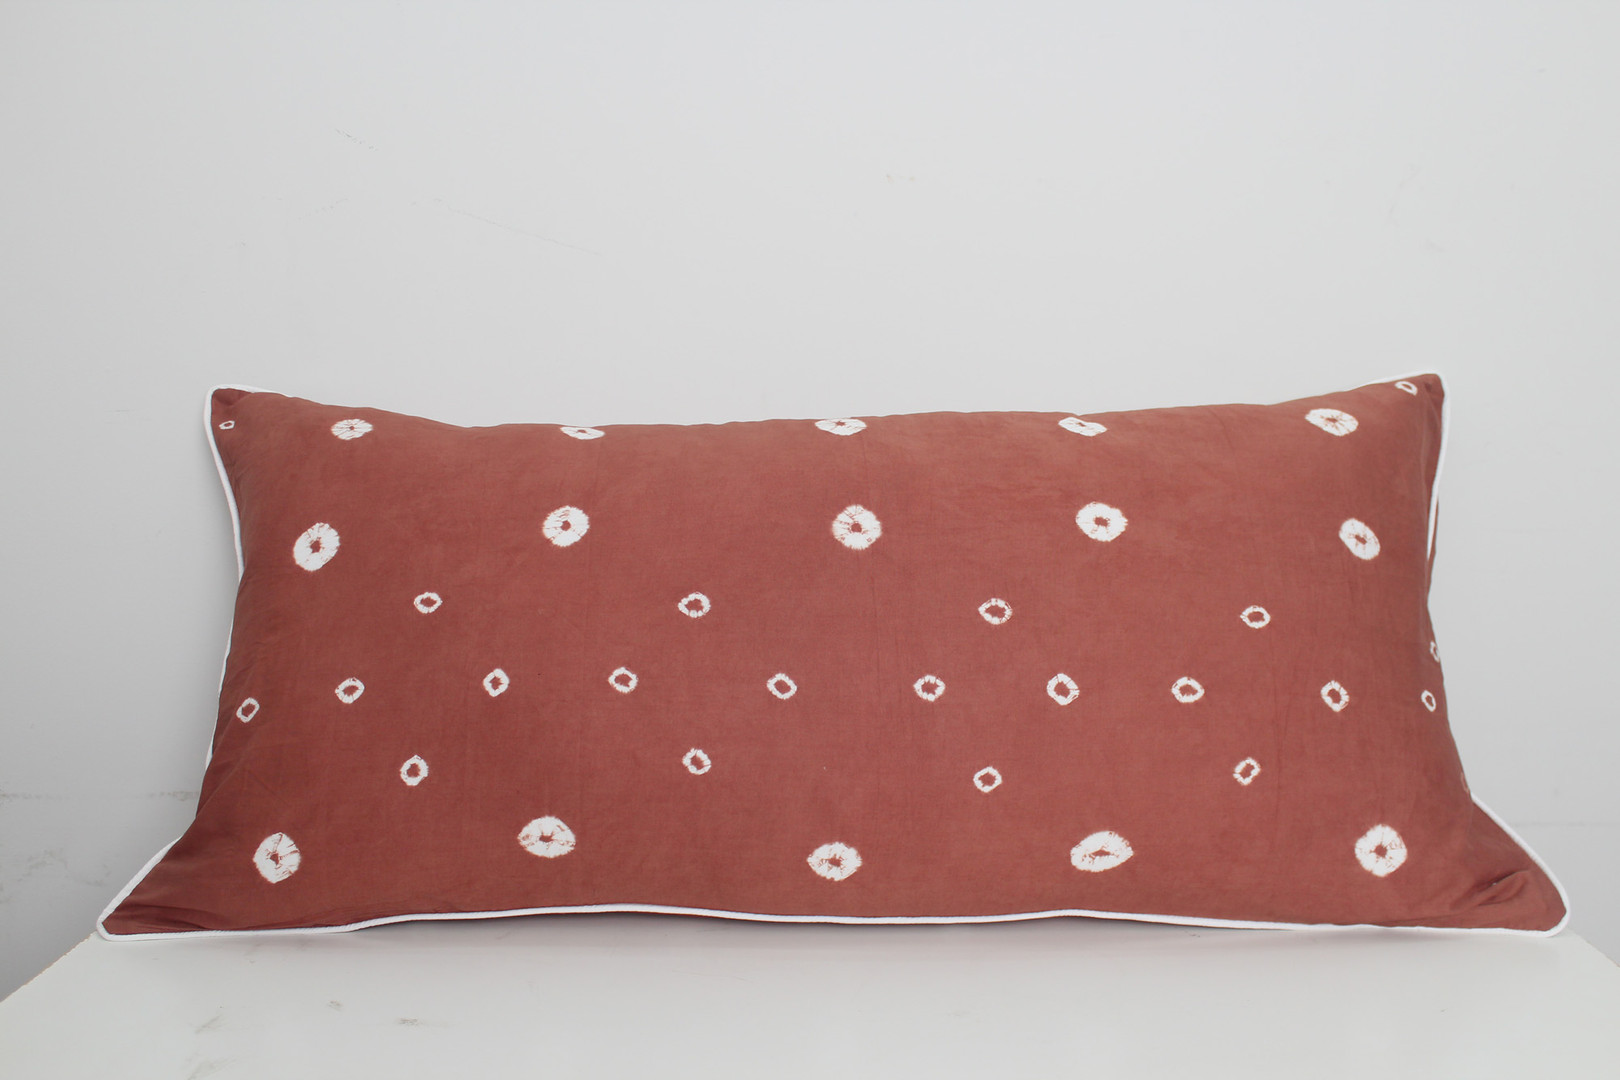 sarung bantal cinta shibori coklat3.jpg